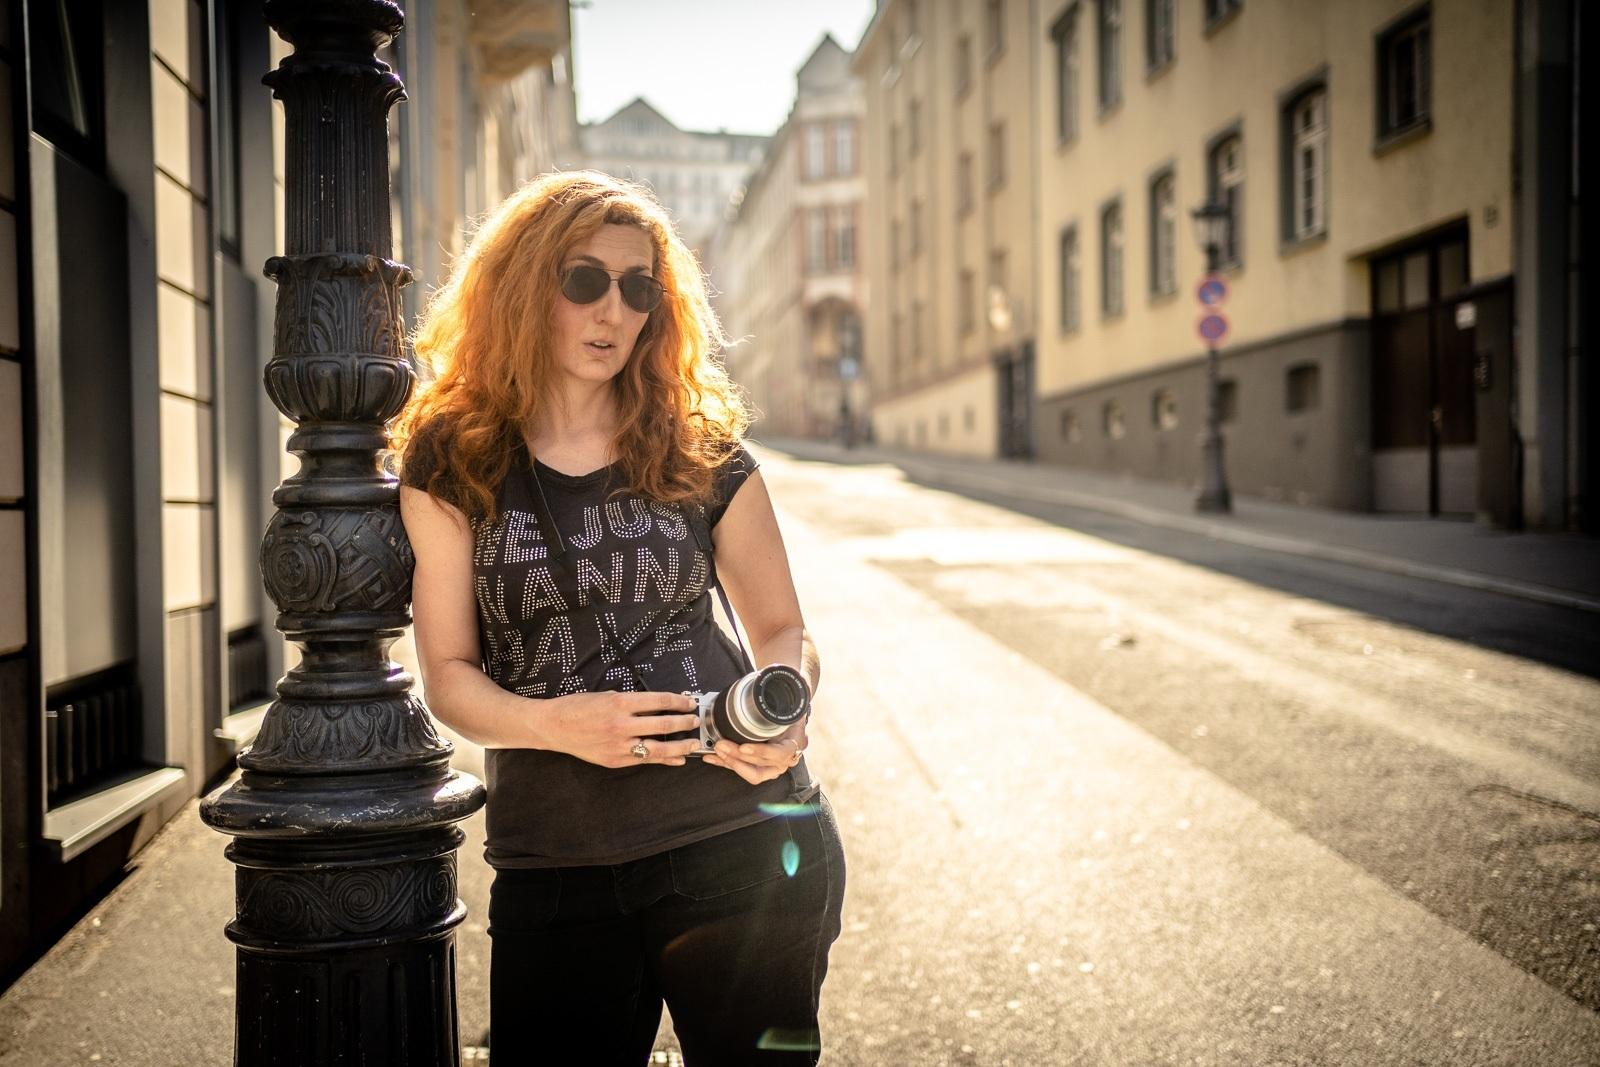 Miriam Spies